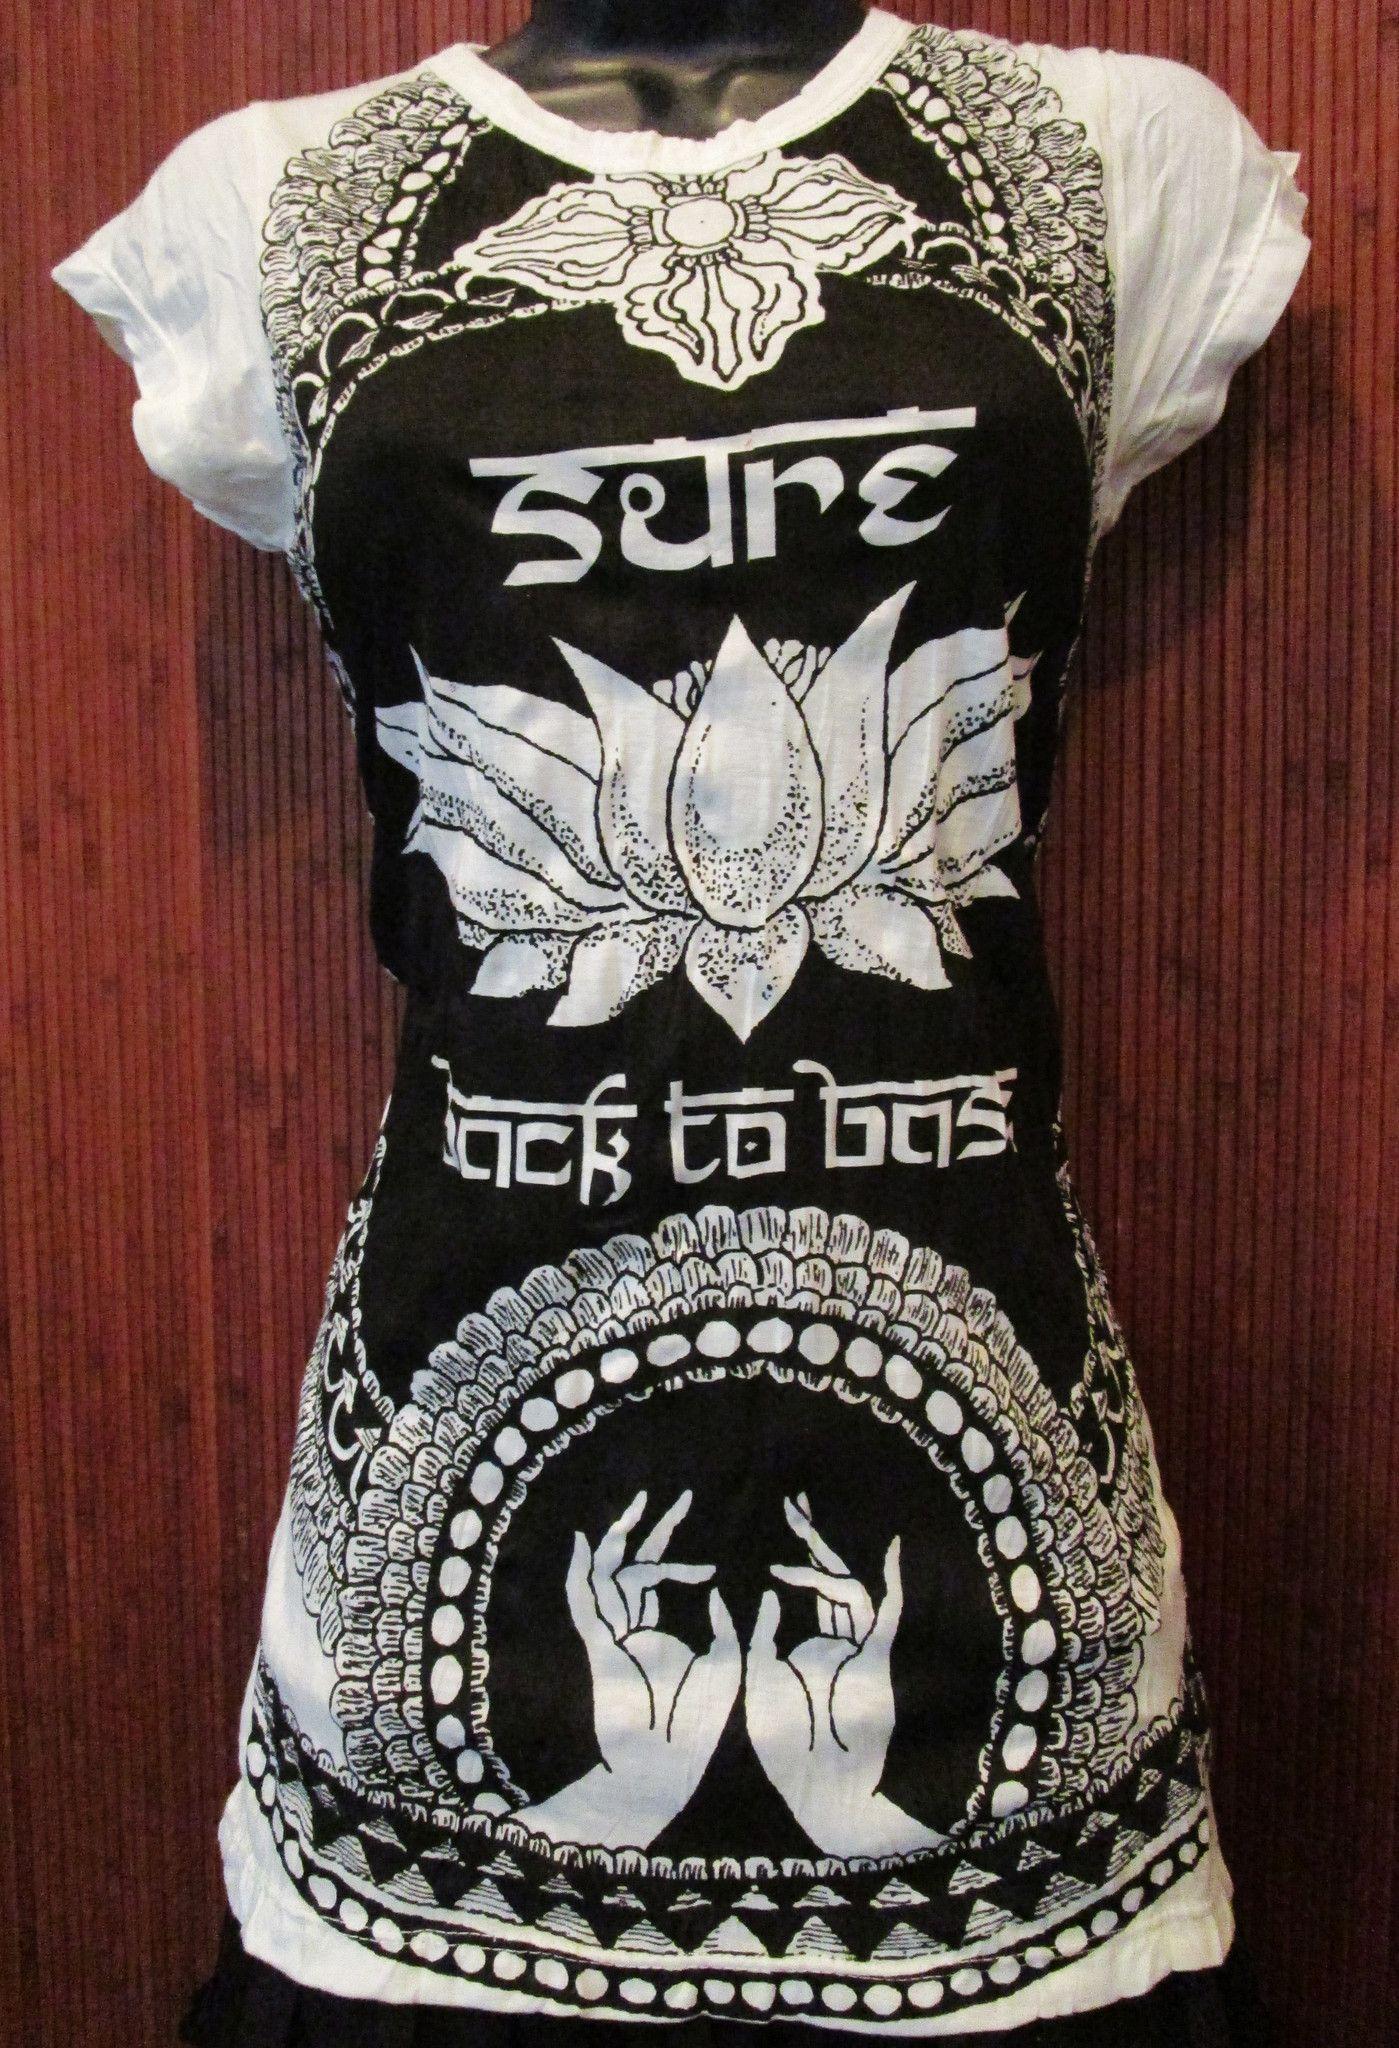 Womens sure design lotus flower t shirt products pinterest womens sure design lotus flower t shirt izmirmasajfo